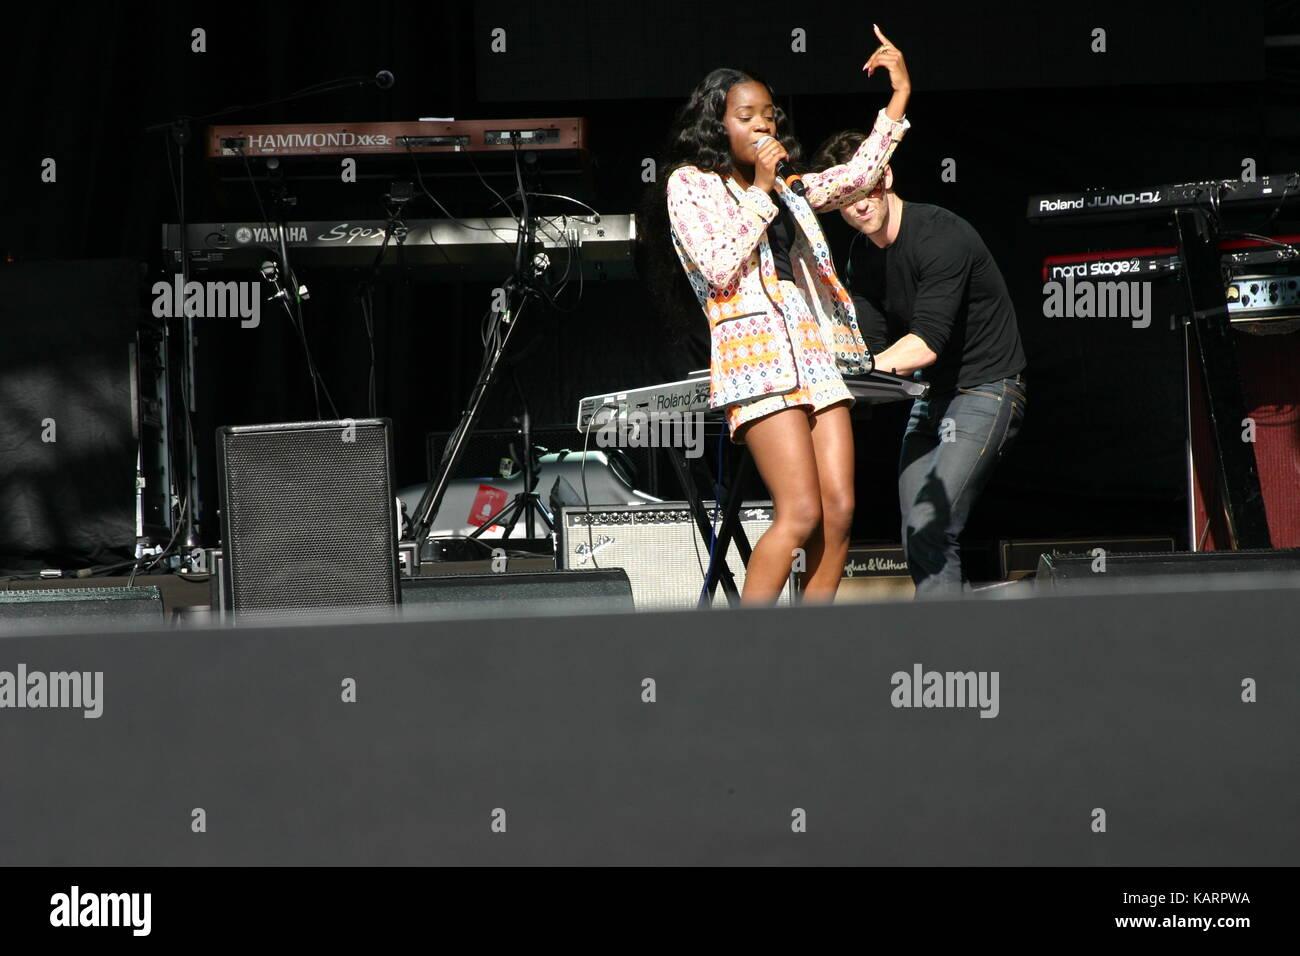 AMS  performing at Eirias Stadium Colwyn bay Wales Stock Photo